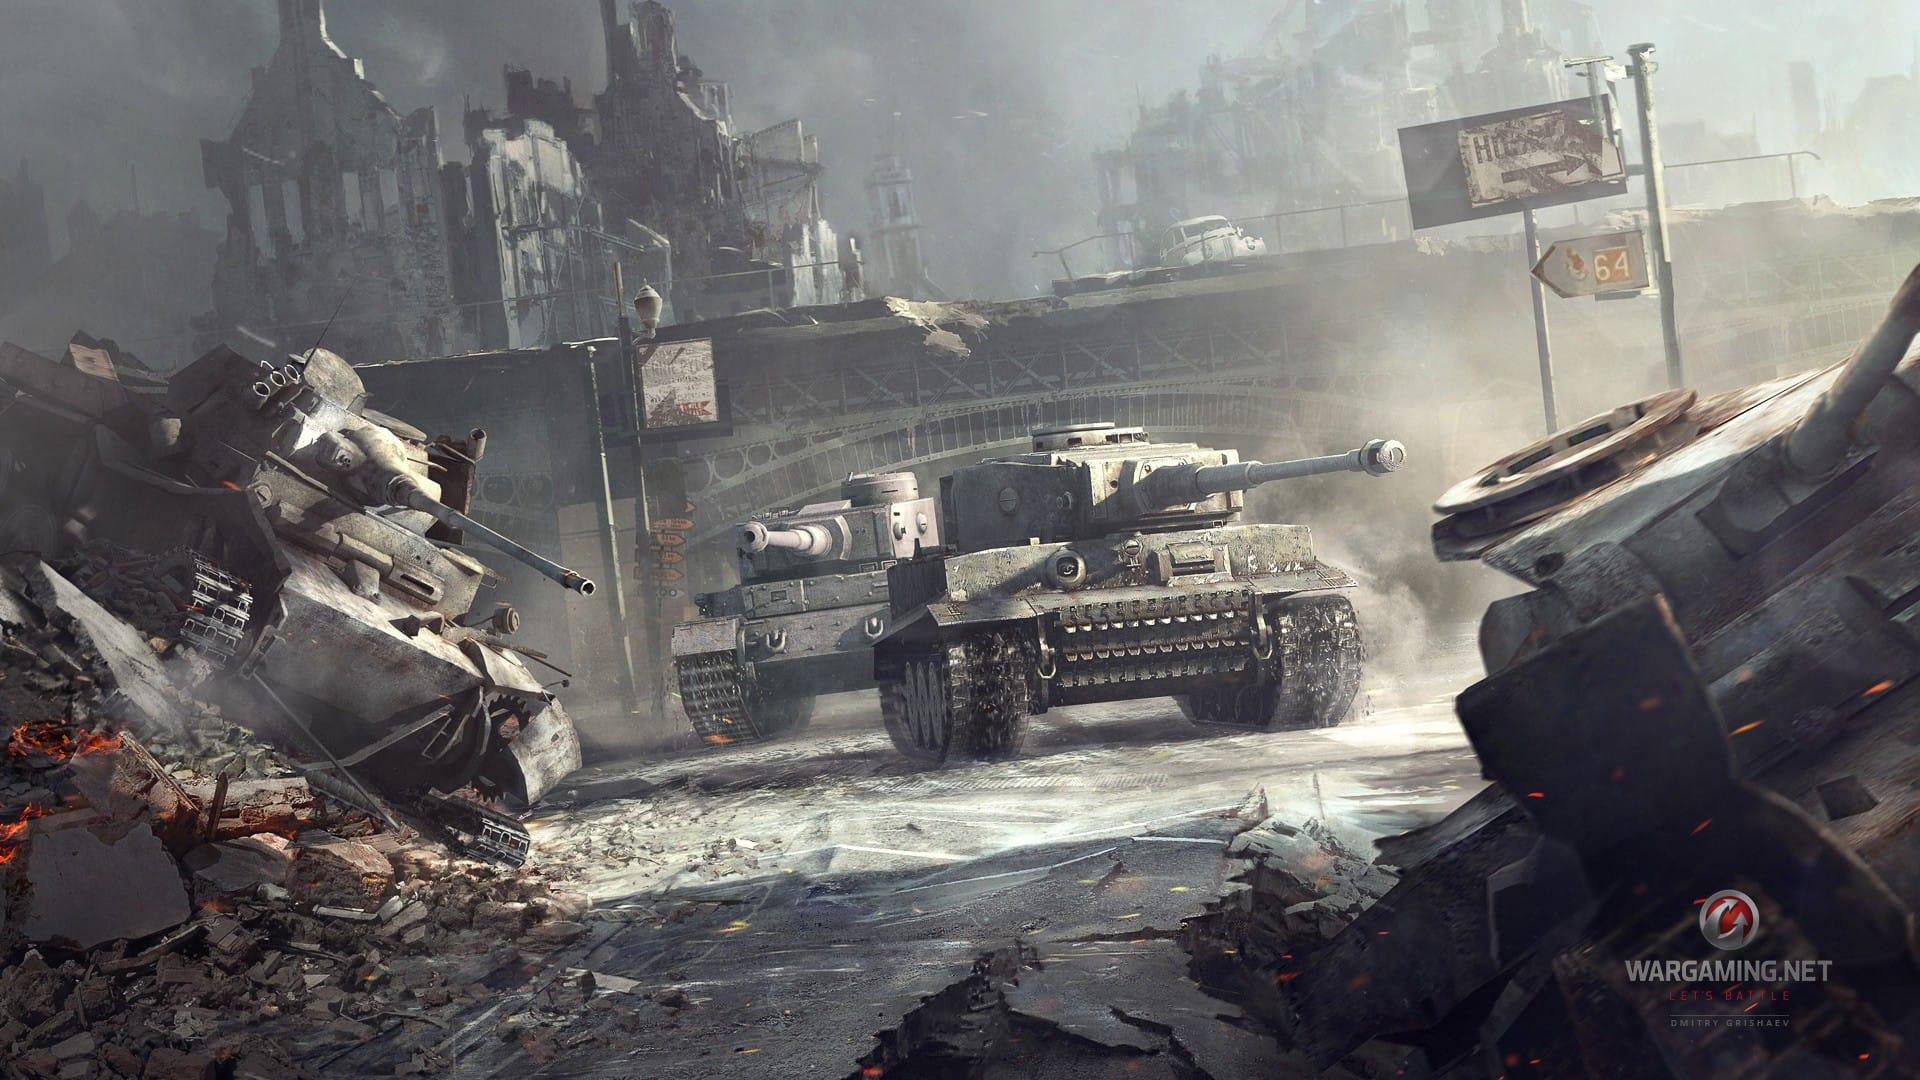 The Unity World of Tanks